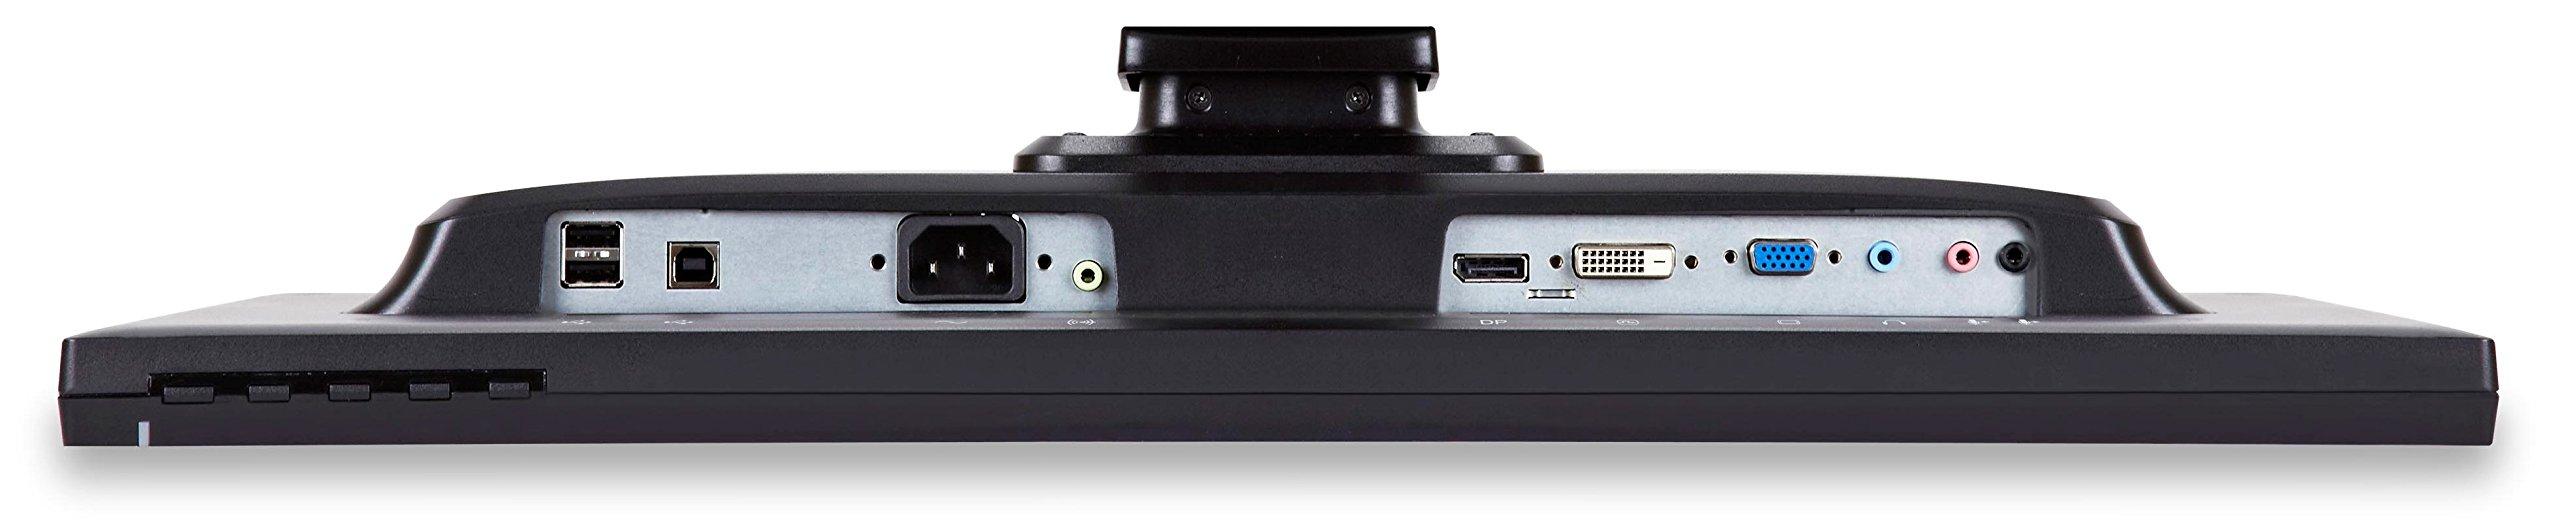 ViewSonic VG2437SMC 24'' 1080p Ergonomic Monitor DisplayPort, DVI, VGA, WebCam by ViewSonic (Image #6)